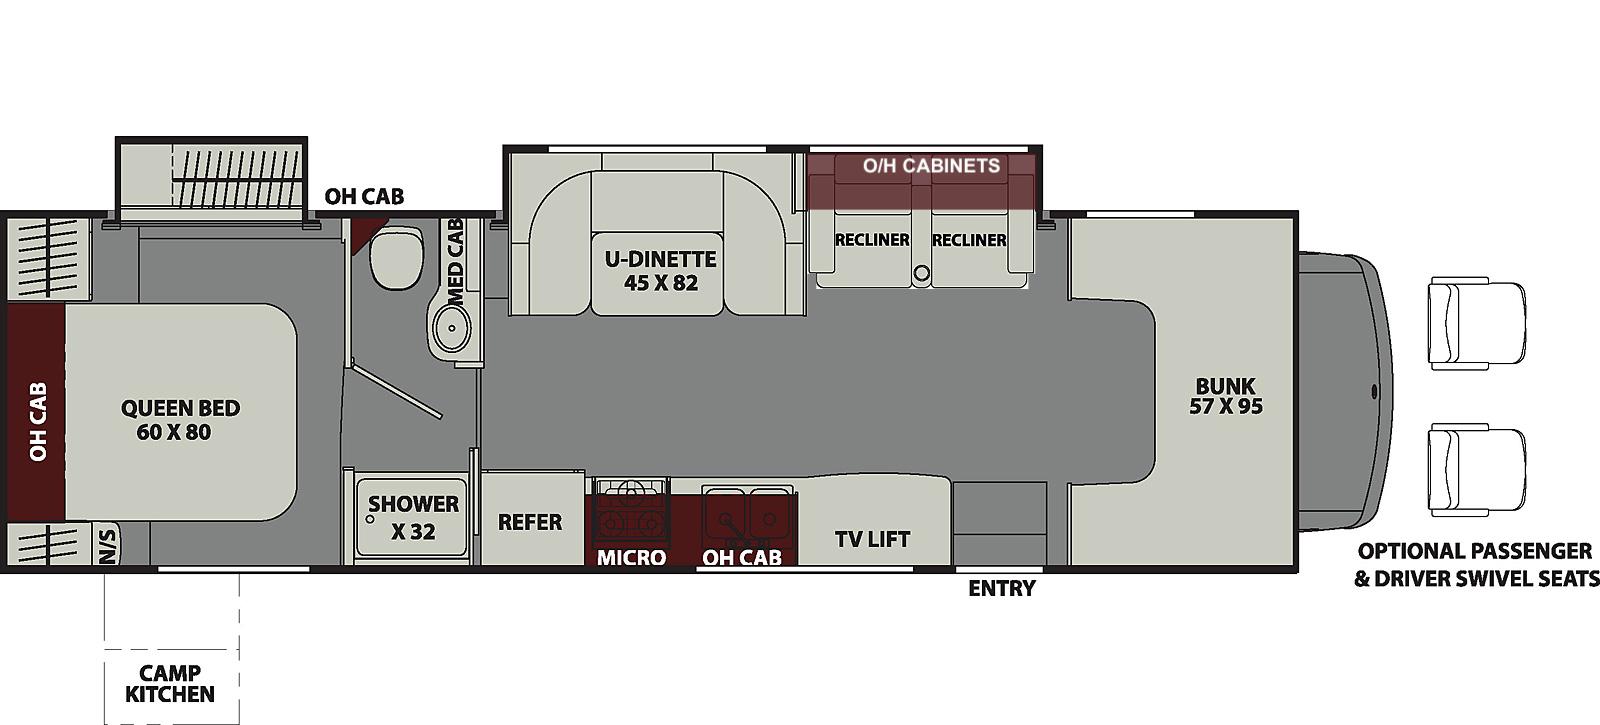 Top 25 Tilden, TX RV Rentals and Motorhome Rentals | Outdoorsy Newmar Cypress Wiring Diagram on